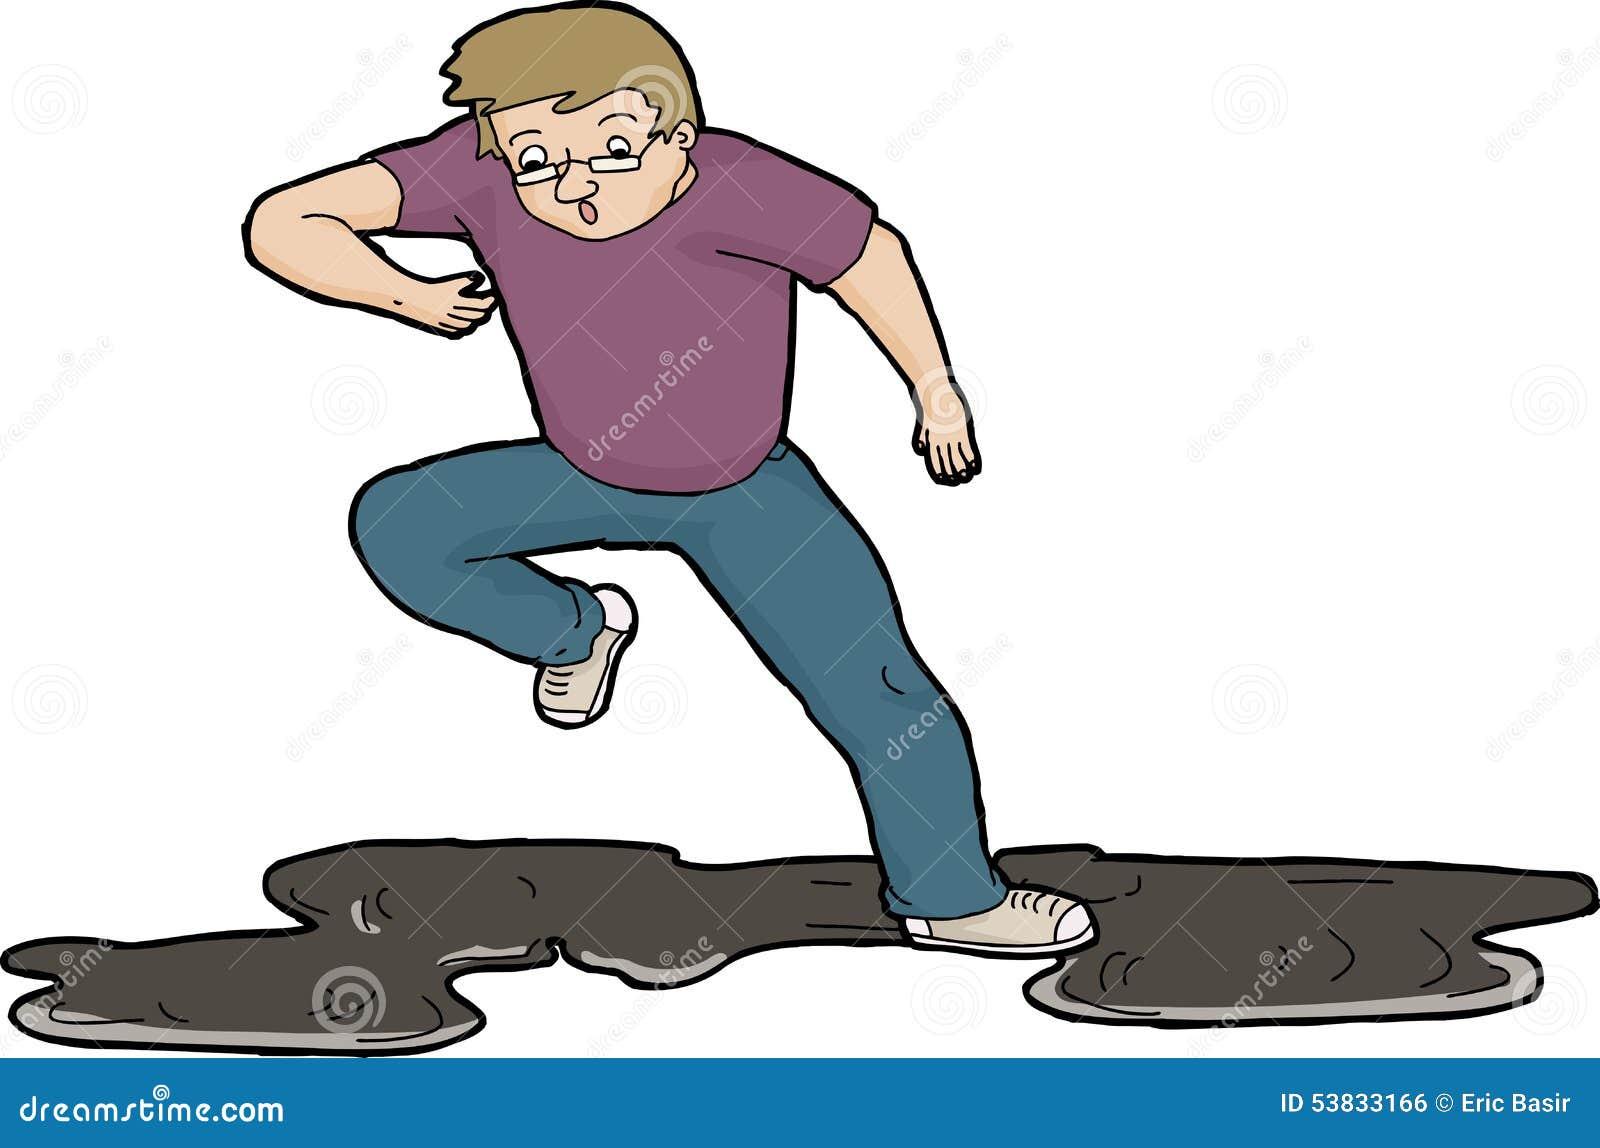 Cartoon Man Slipping On Spillage Royalty Free Stock Image - Image ...